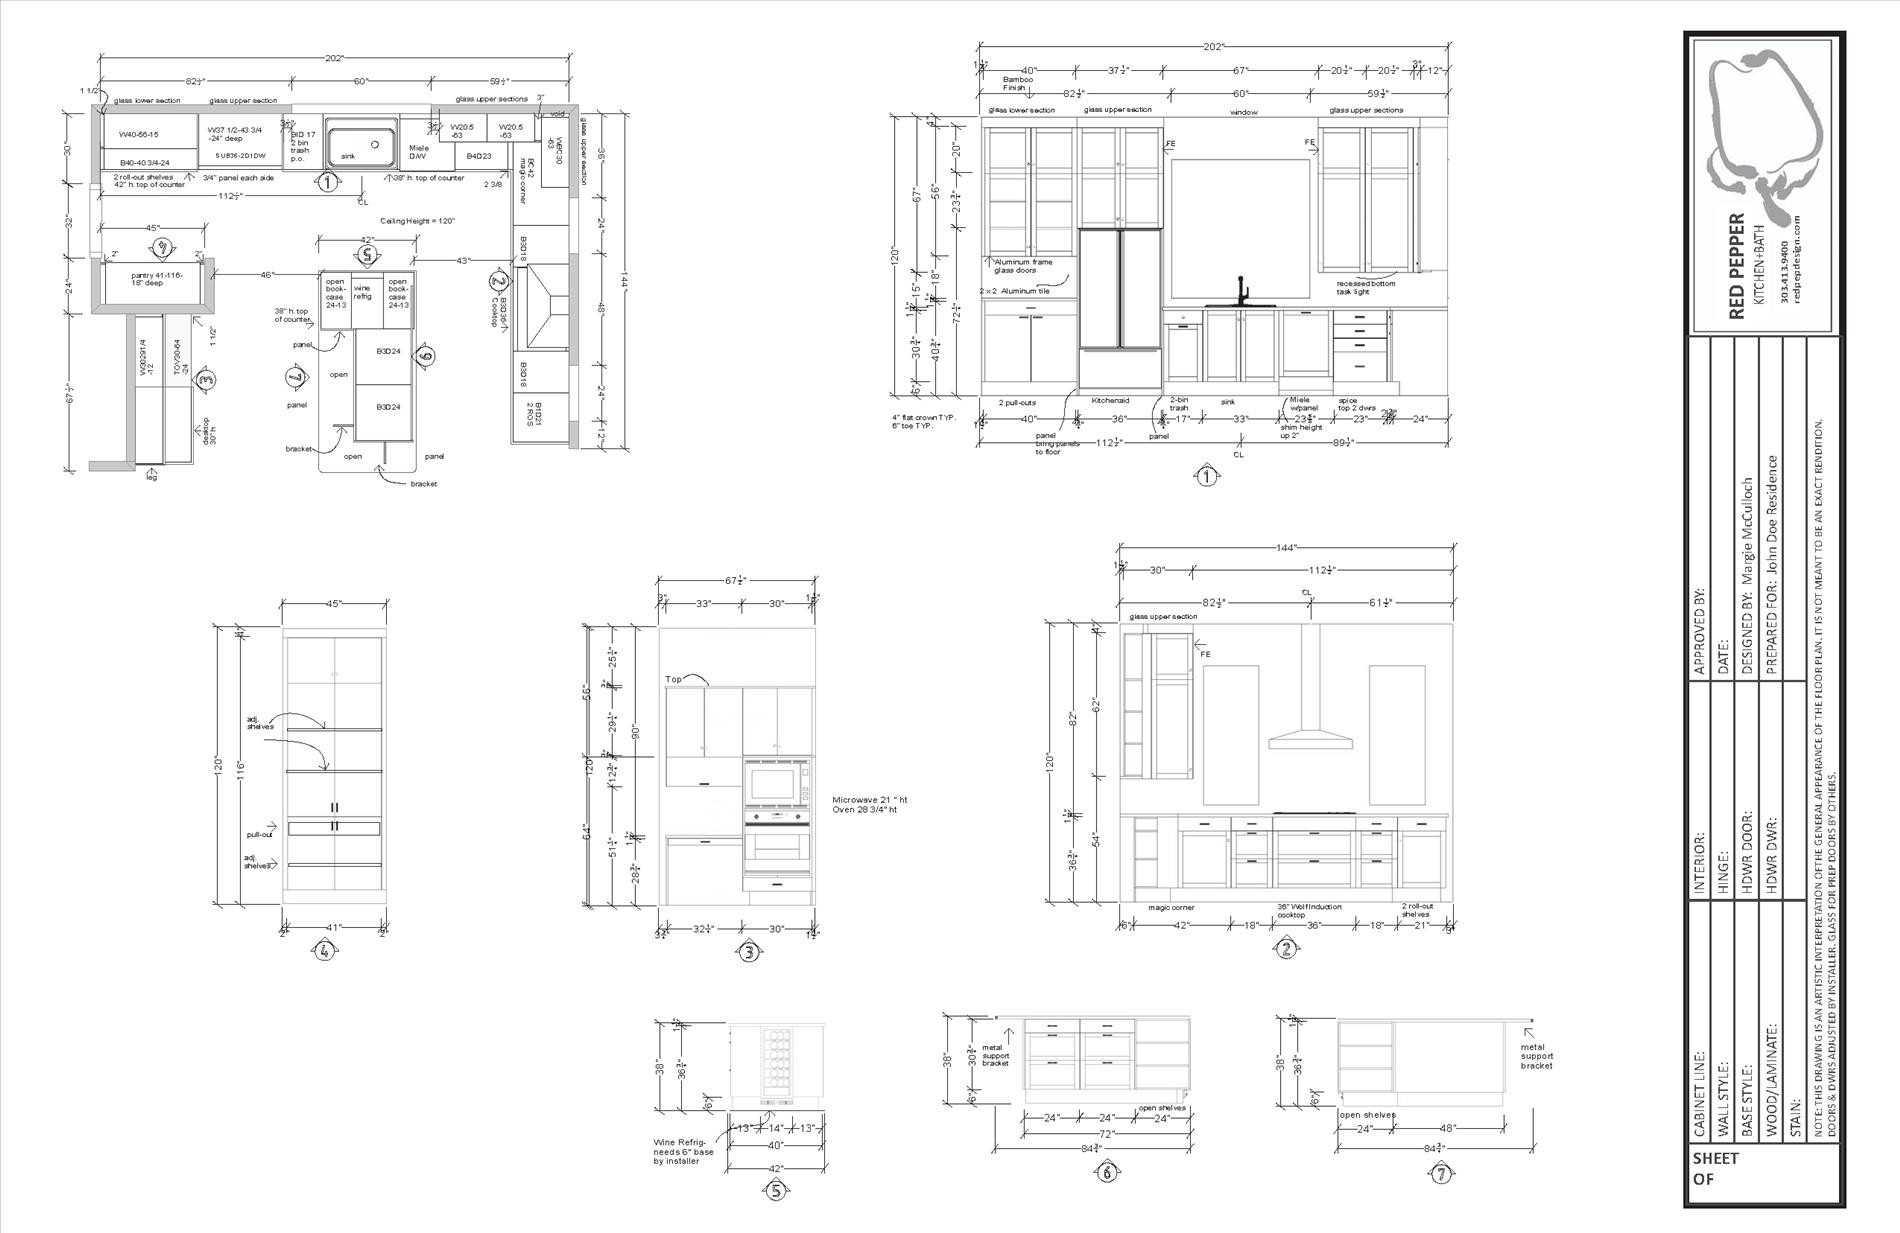 1900x1233 Awning Wood Jeldwen S U Doors Nih Casement Window Elevation Cad